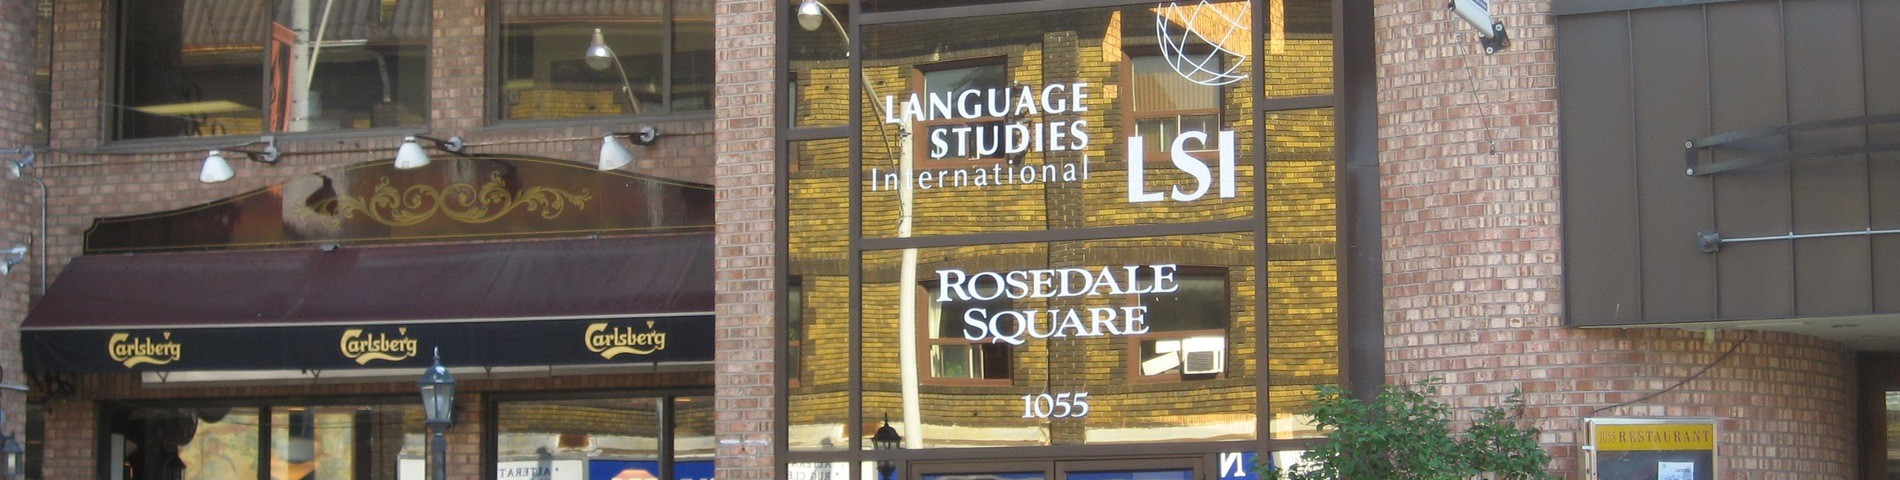 LSI - Language Studies International bilde 1